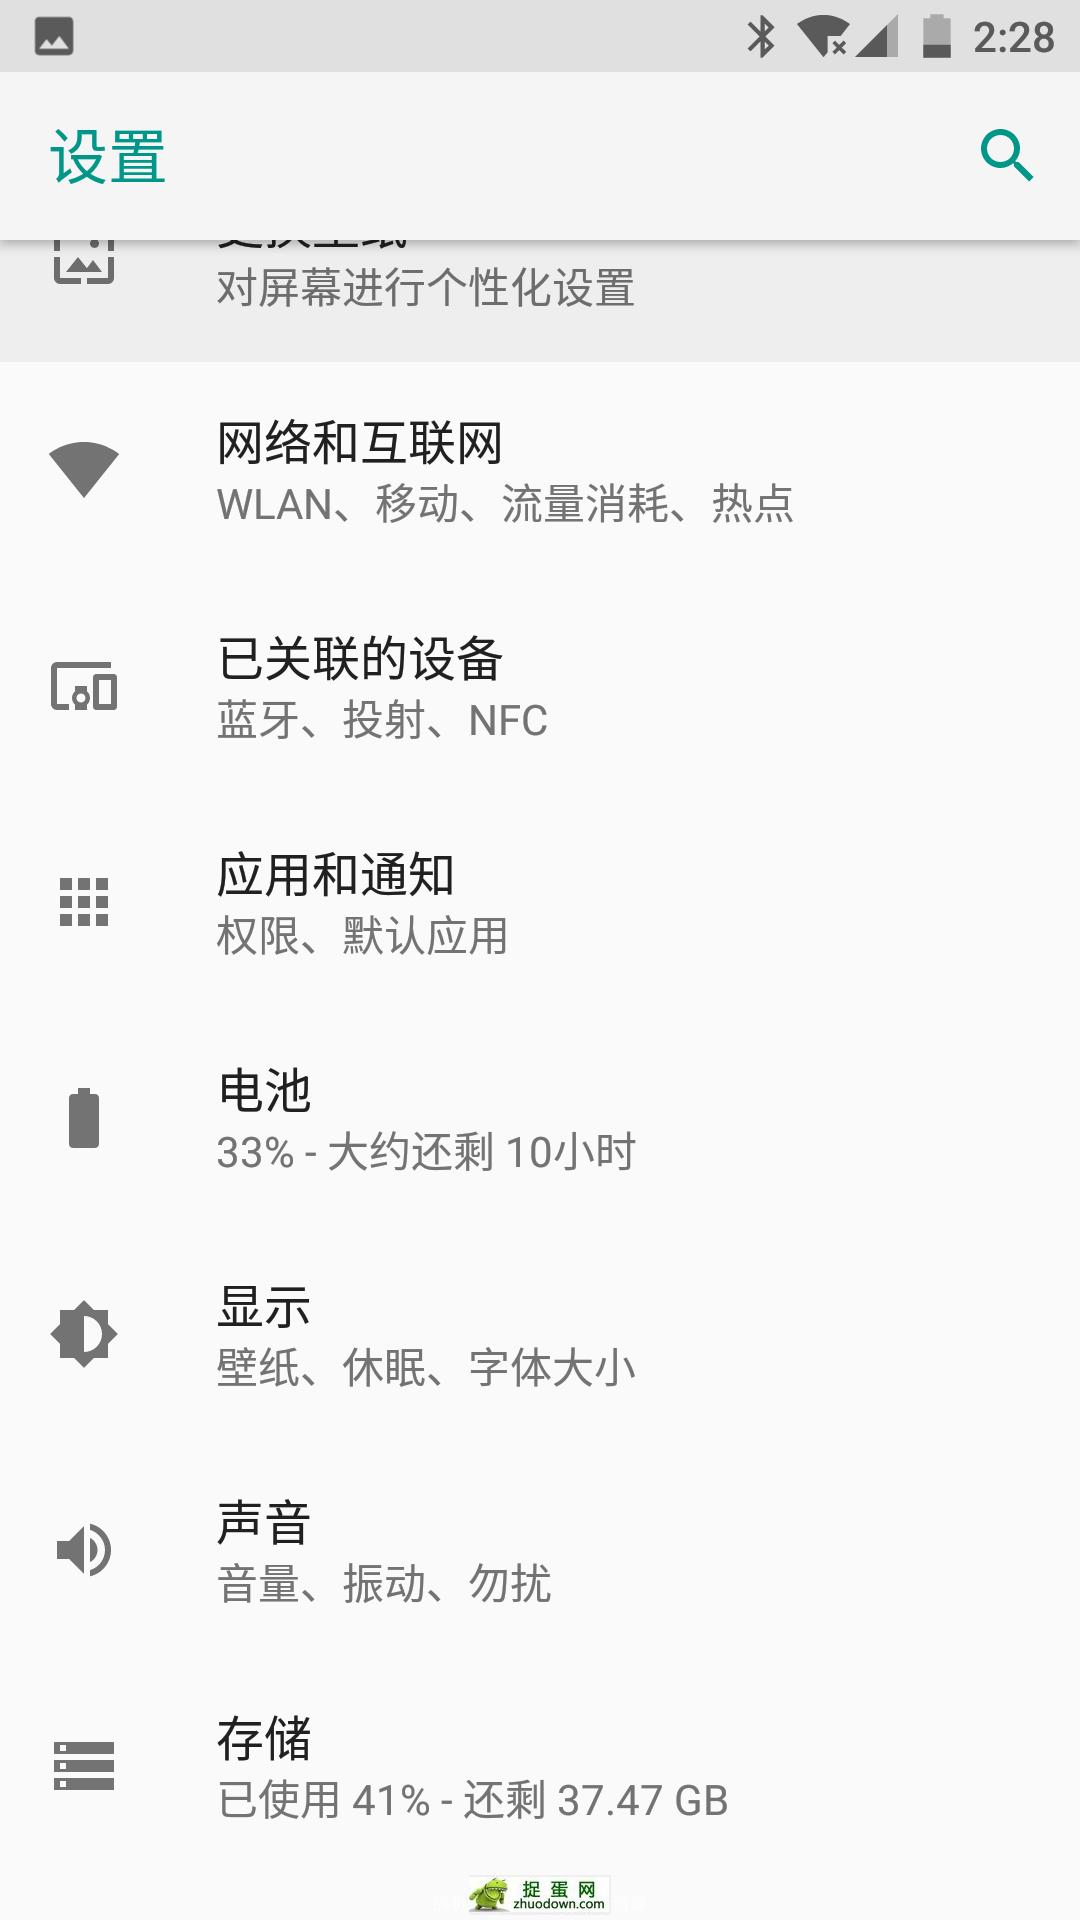 NubiaZ17 lineageos15 安卓8.0 测试第一版]